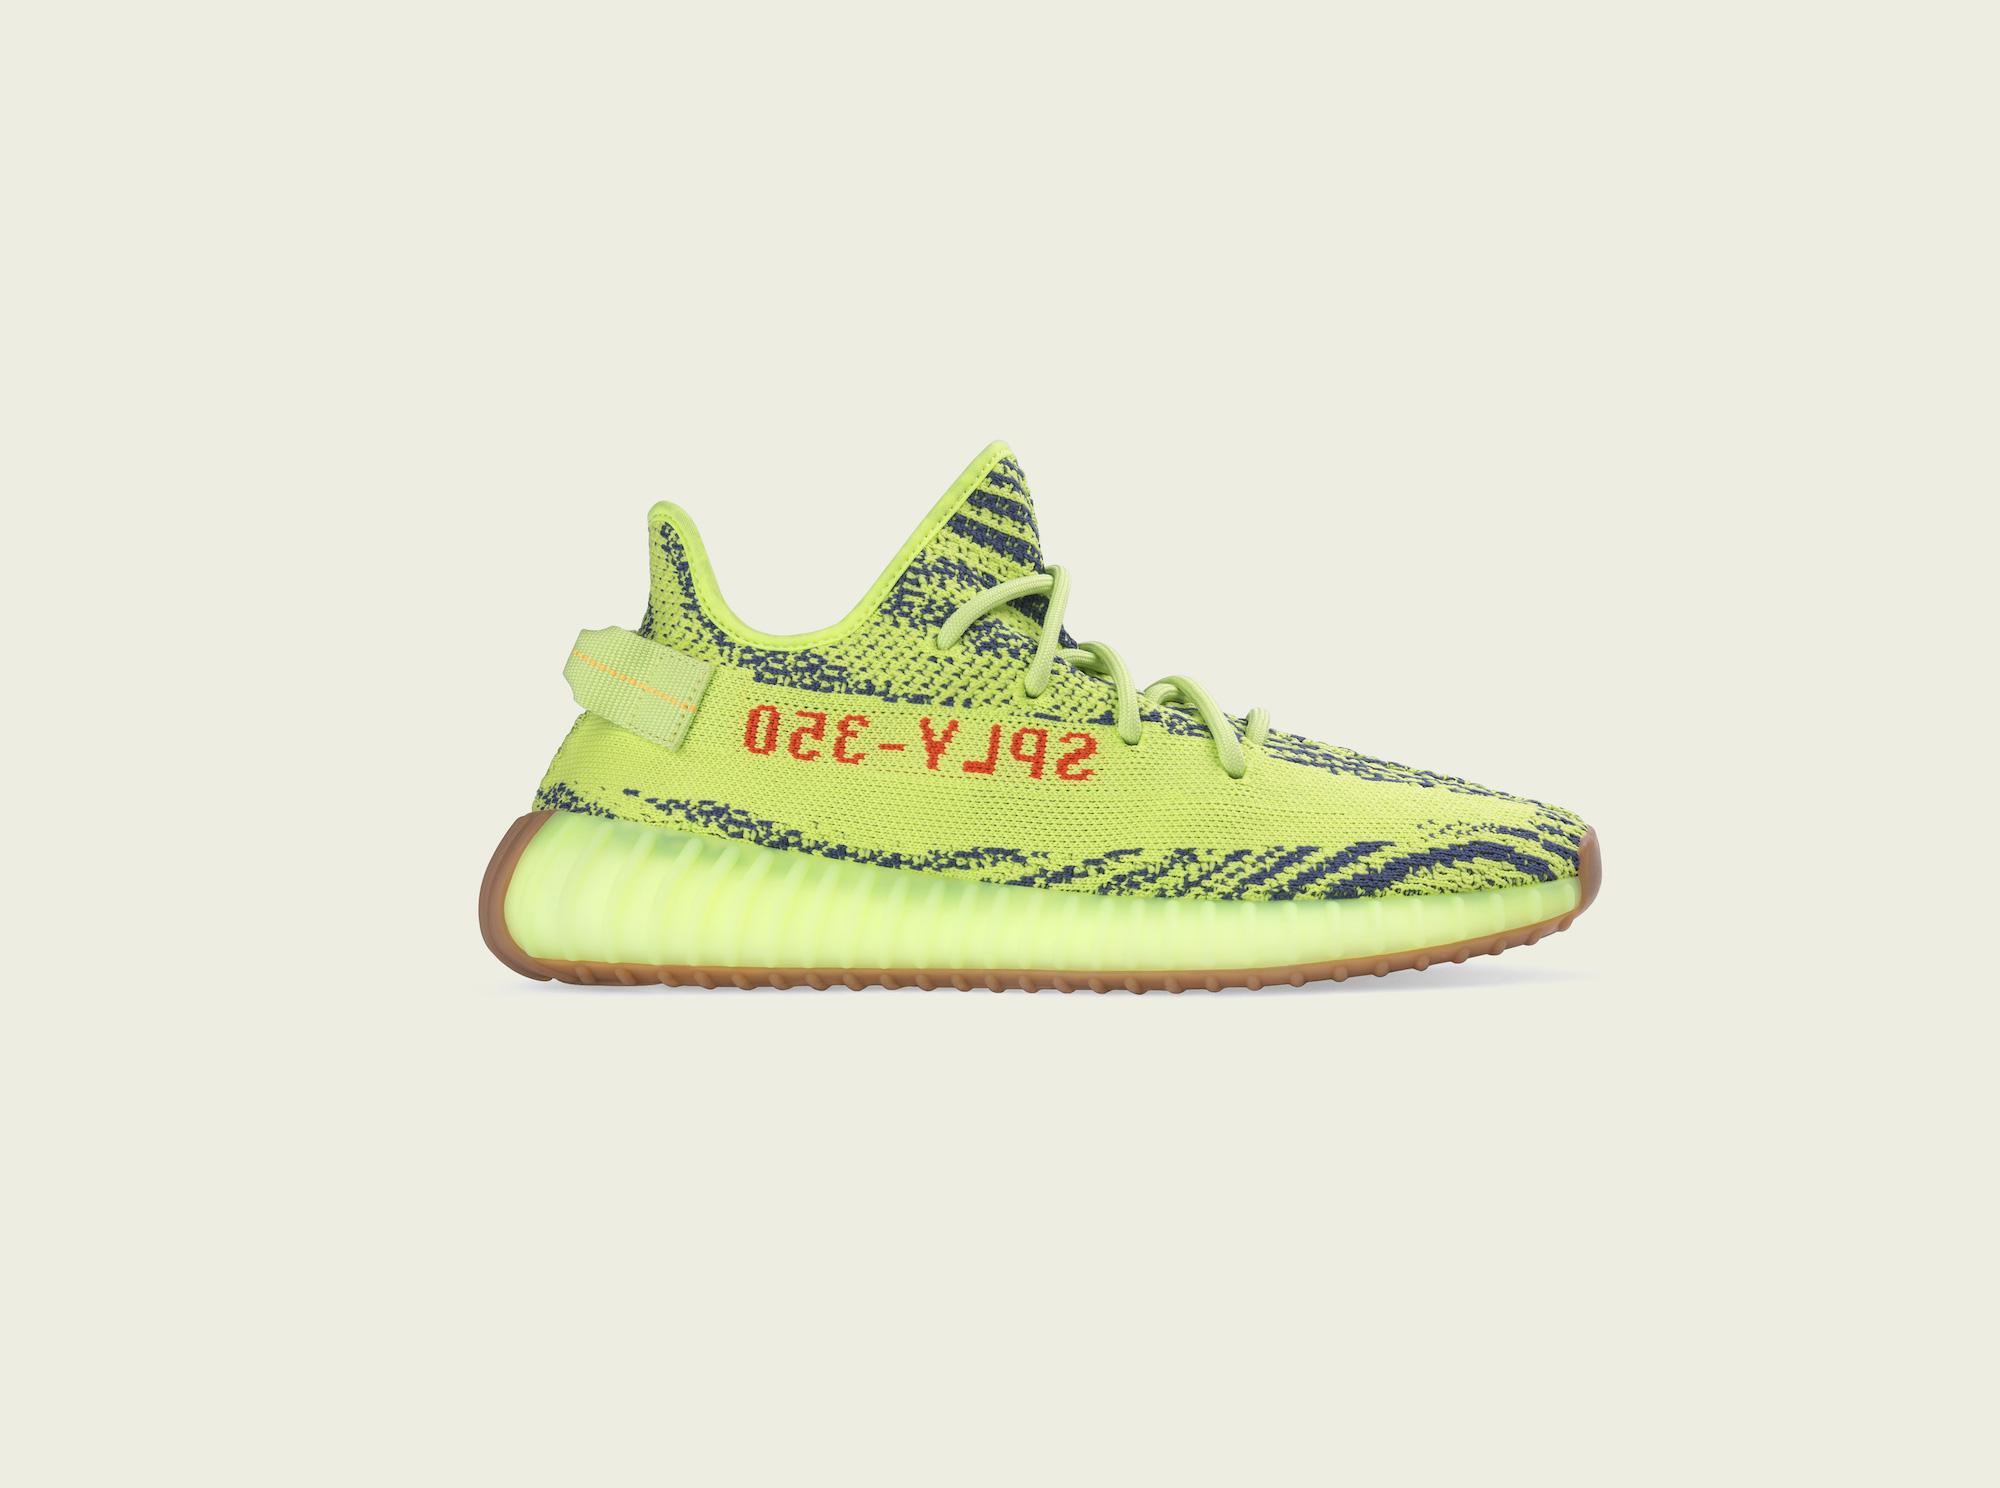 Yeezy Boost 350 V2 Semi Frozen Yellow 4